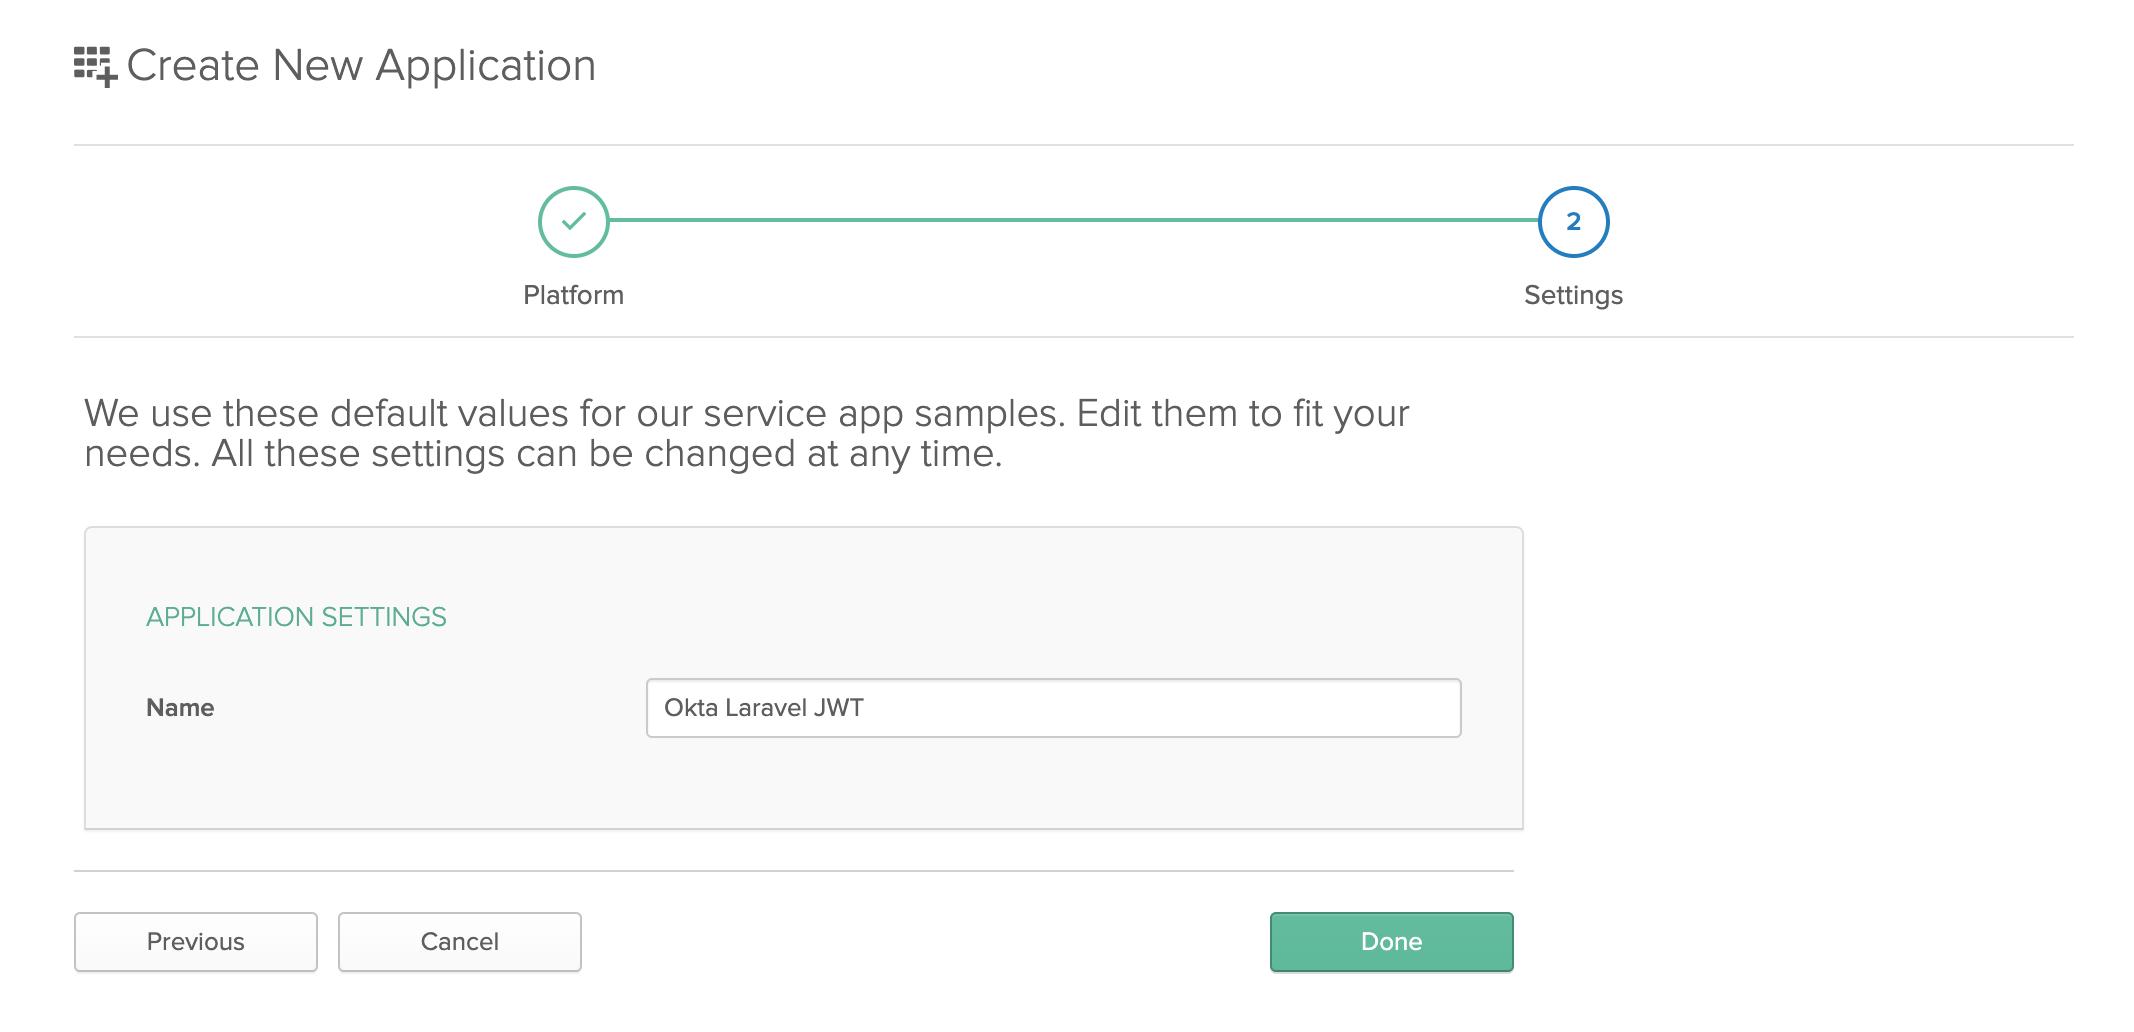 Entering a name for your application in Okta